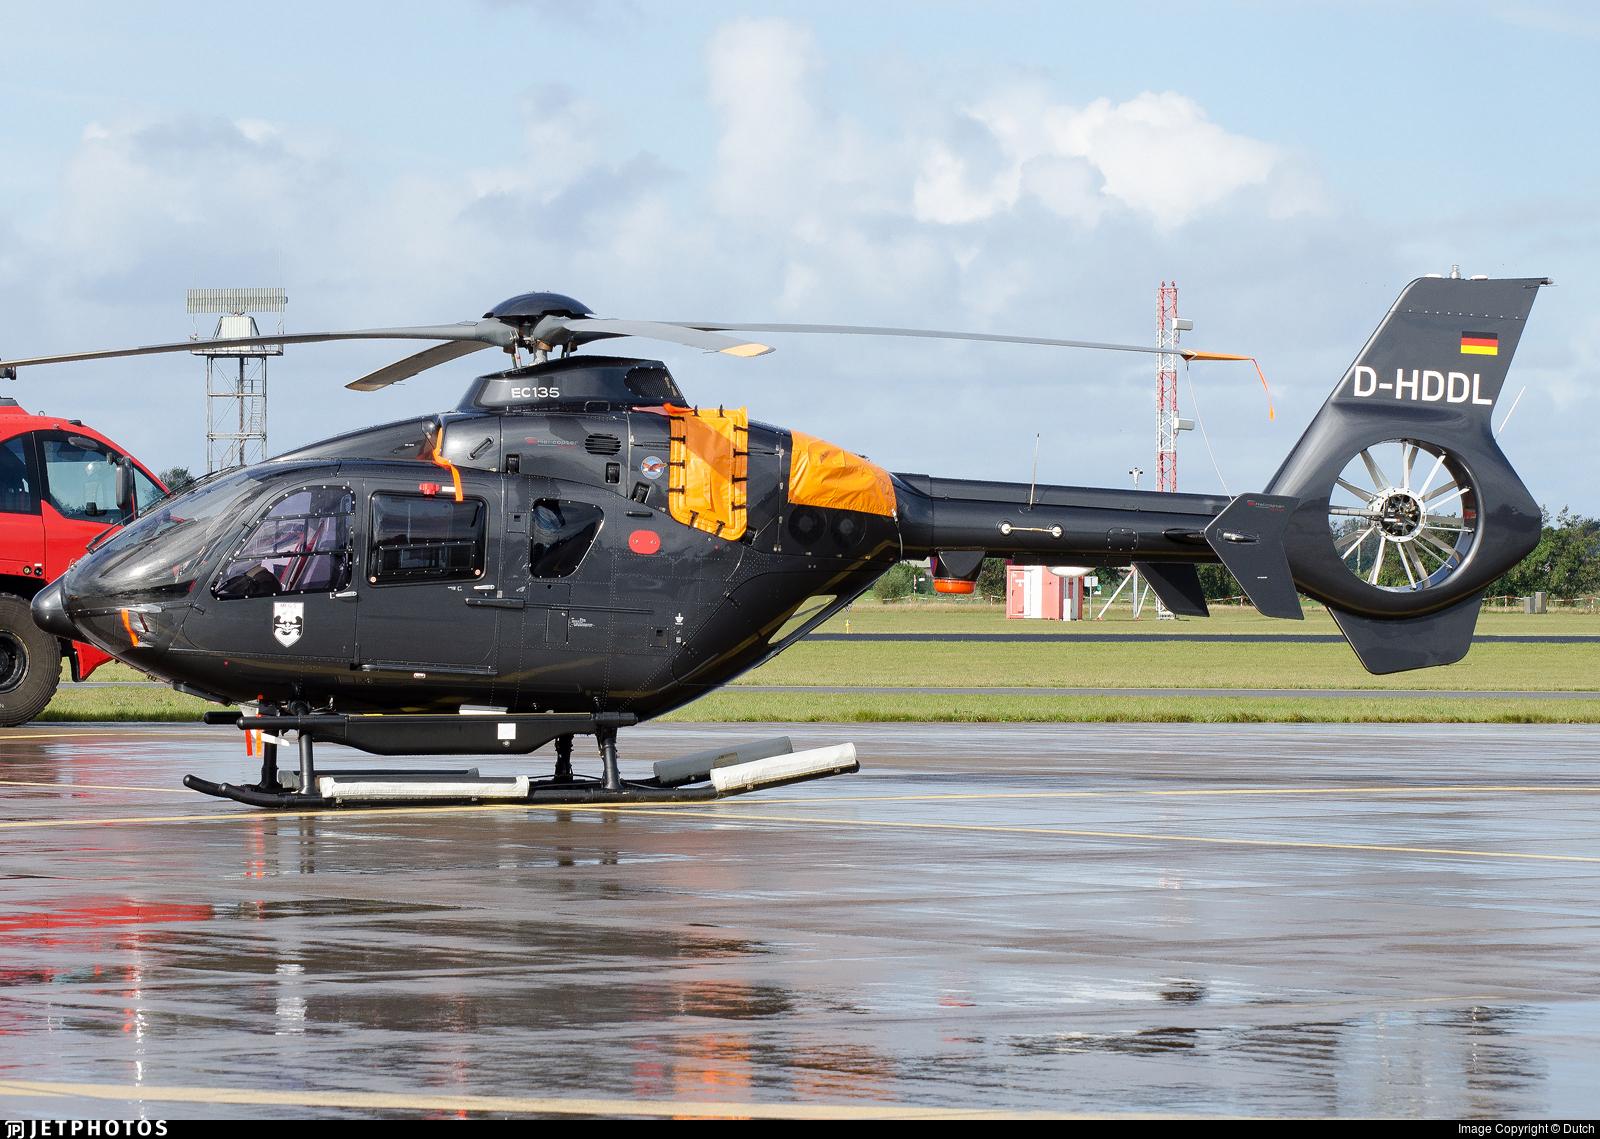 D-HDDL - Eurocopter EC 135P2+ - DL Helicopter